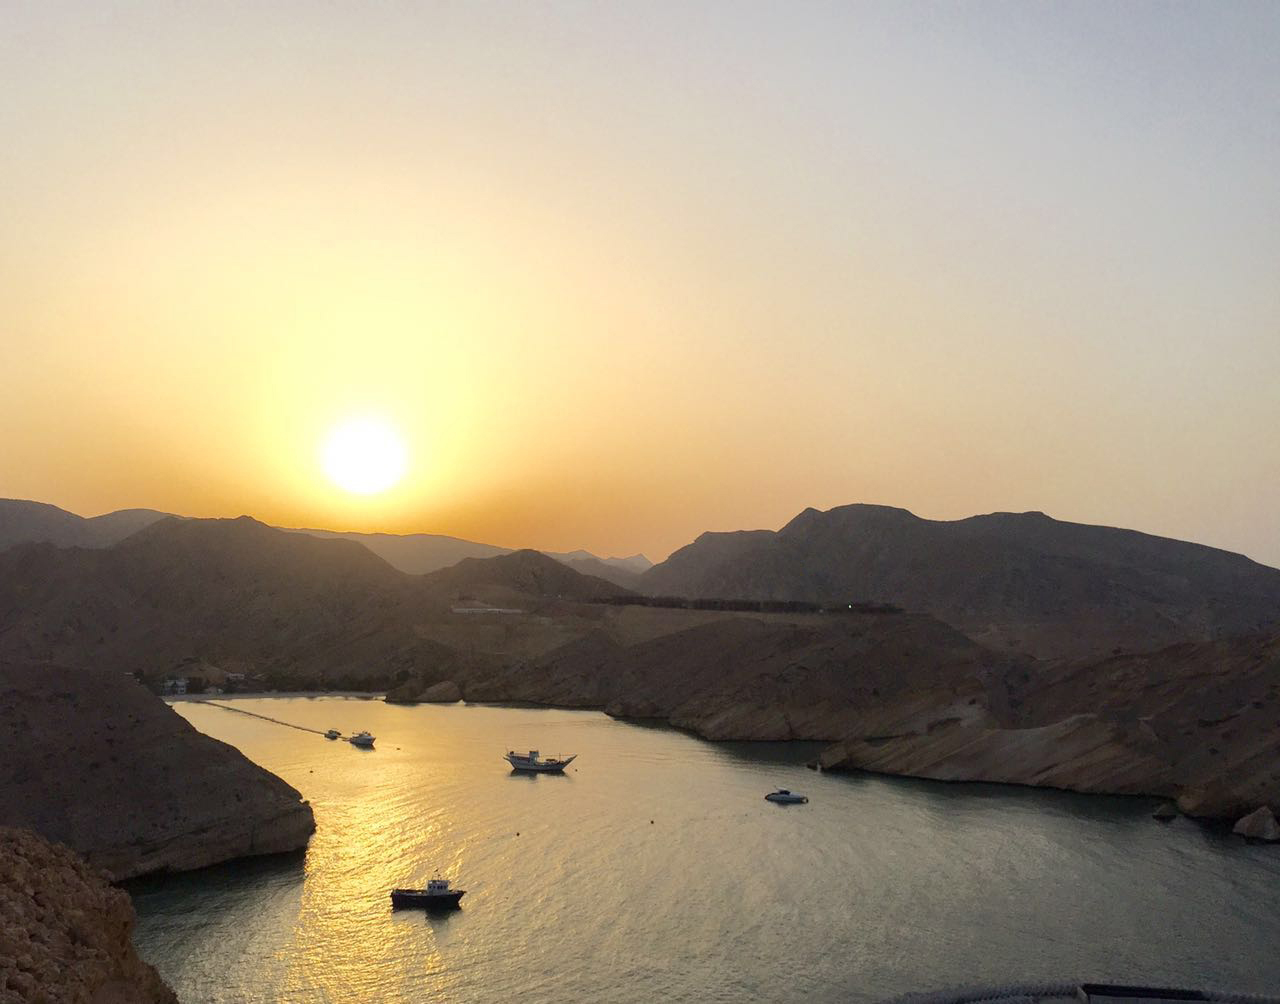 A new dawn set for Oman beauty spot